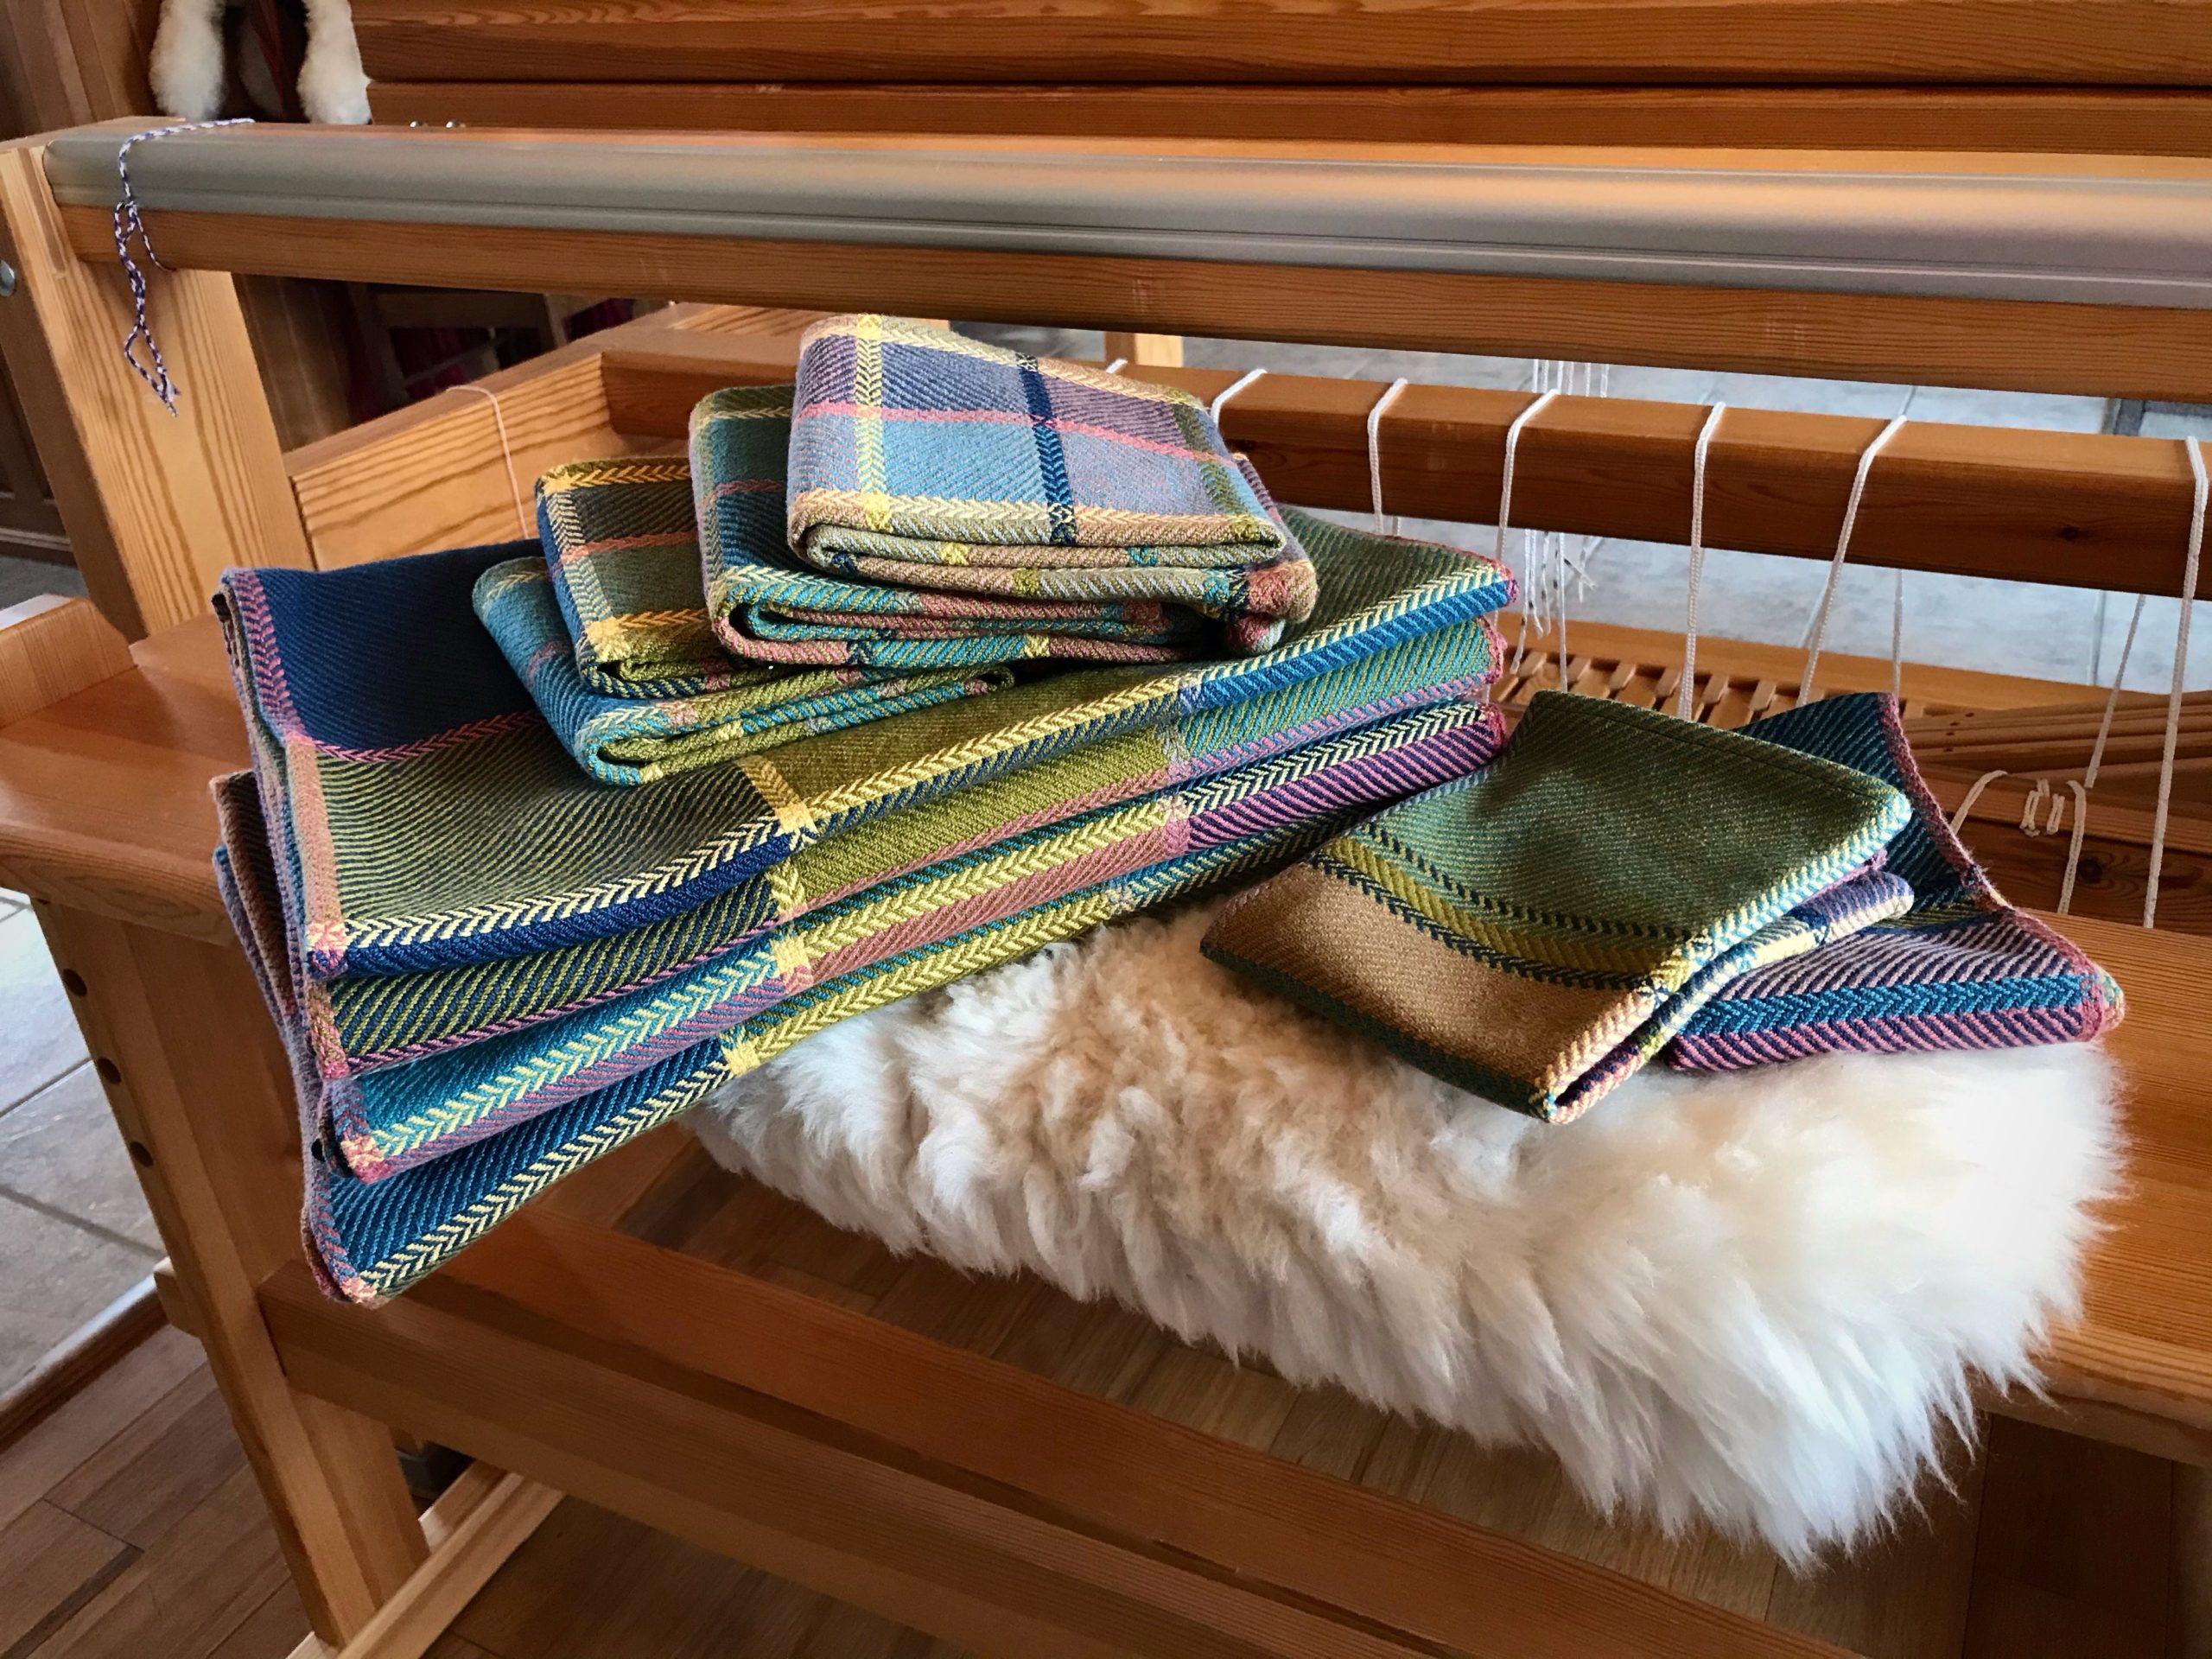 Cottolin bath set. Handwoven bath towels, hand towels, wash cloths.